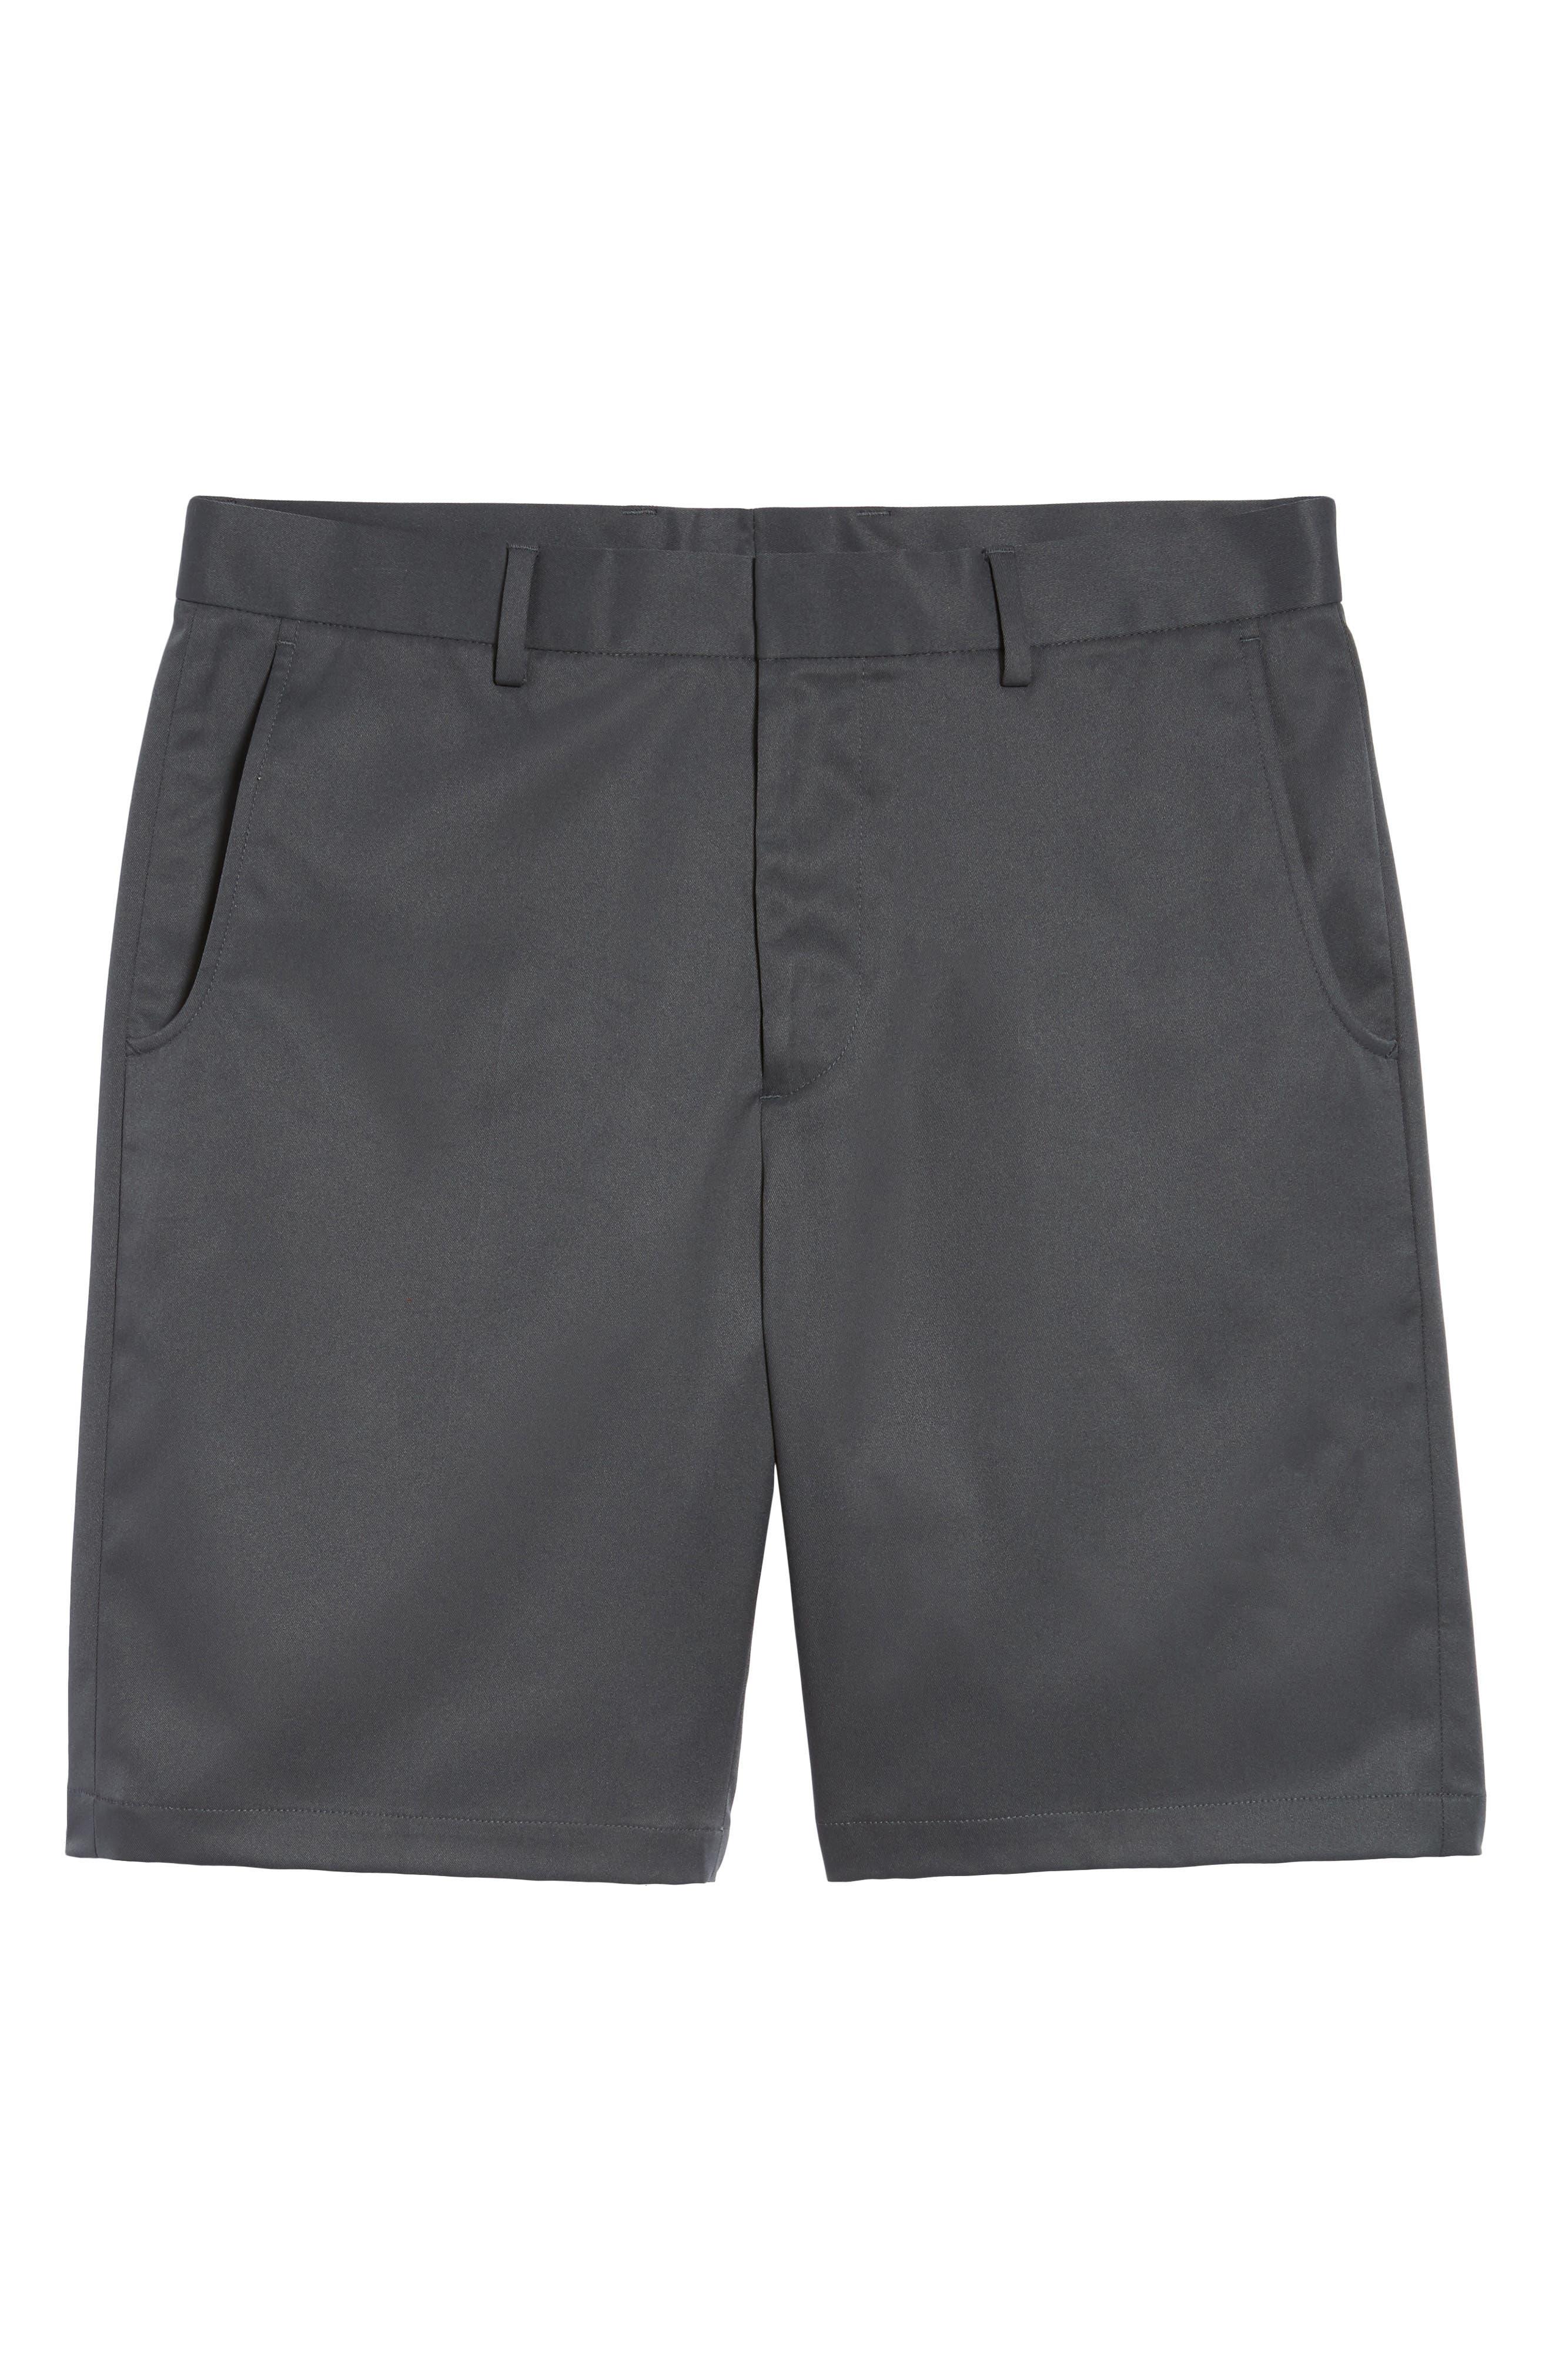 BOBBY JONES, Flat Front Tech Shorts, Alternate thumbnail 6, color, CHARCOAL